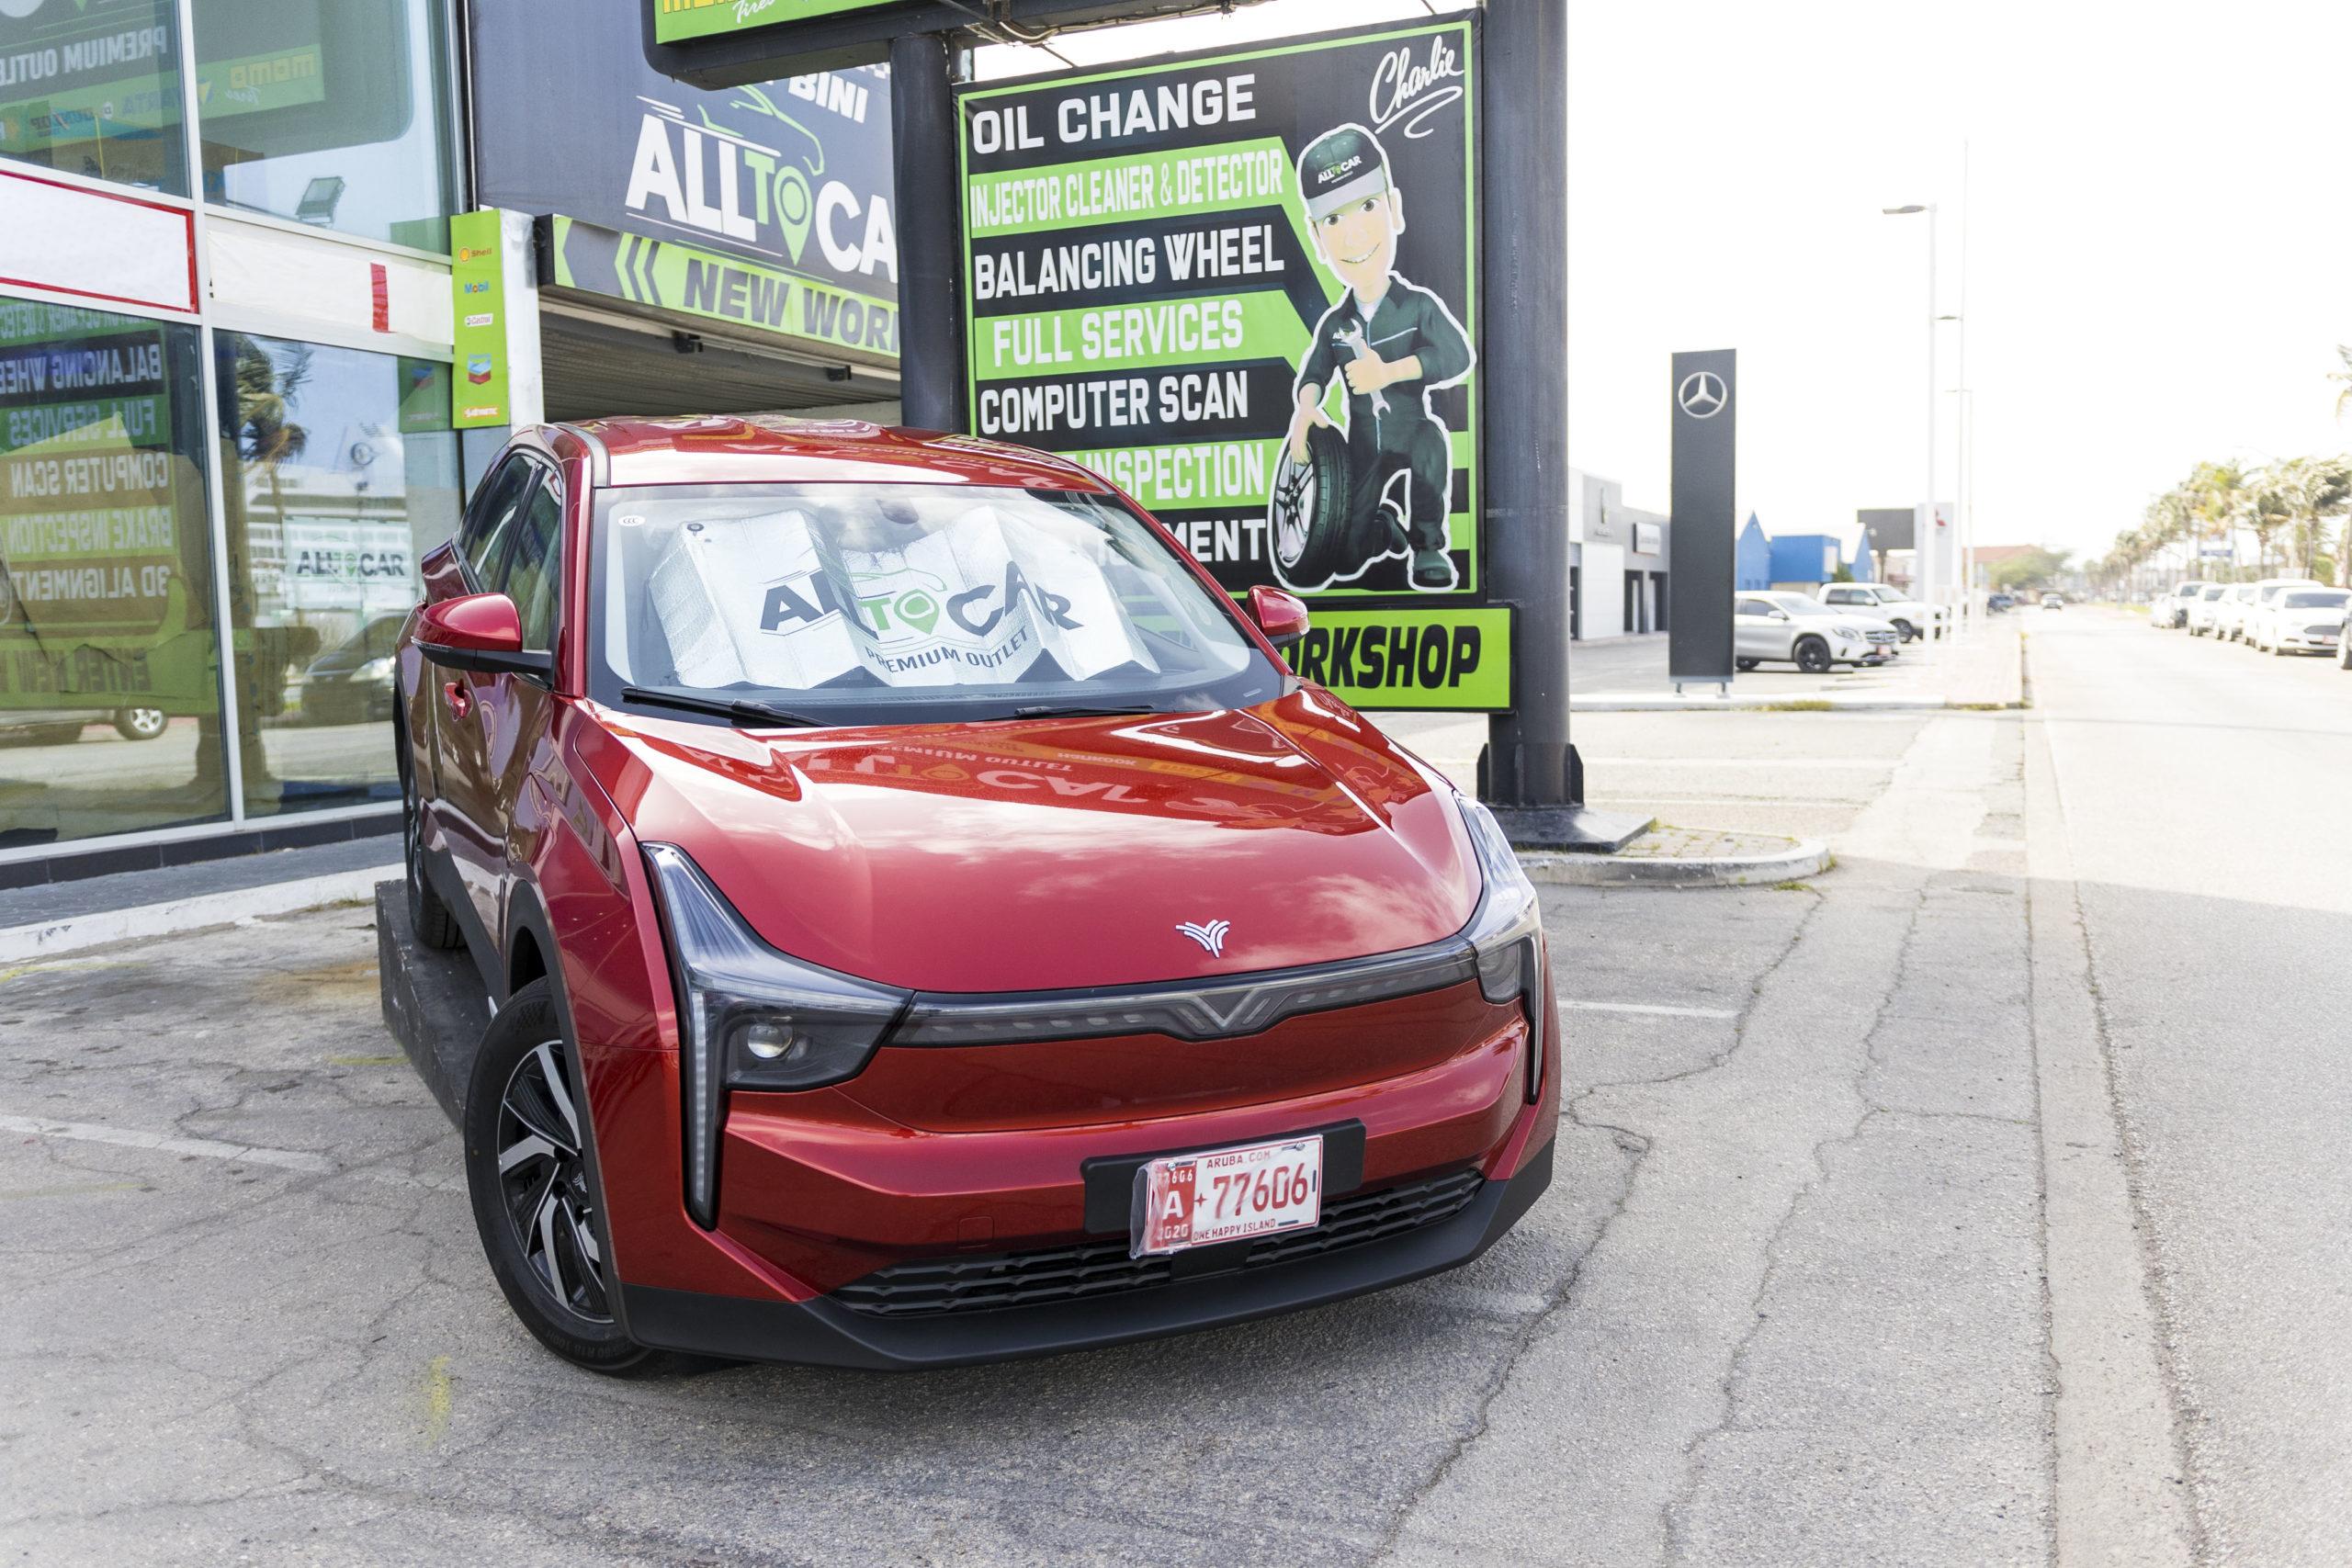 Spaar hopi: Pasa na All-to-Car pa busca bo vehiculo electrico